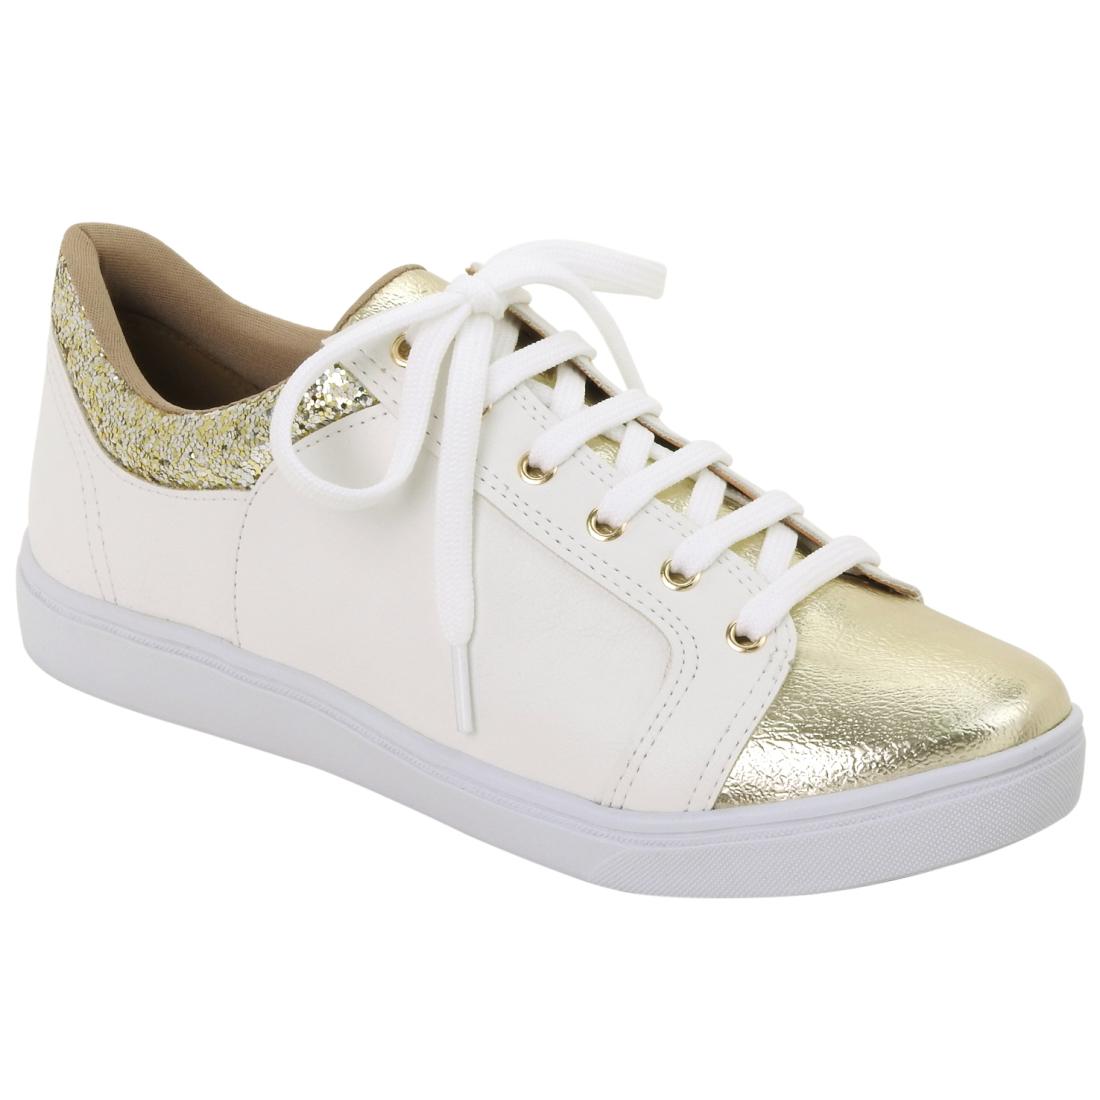 16-12406-DOURADO-BRANCO-MULTI Moda de rua: Tenis e sapatos Metalizados